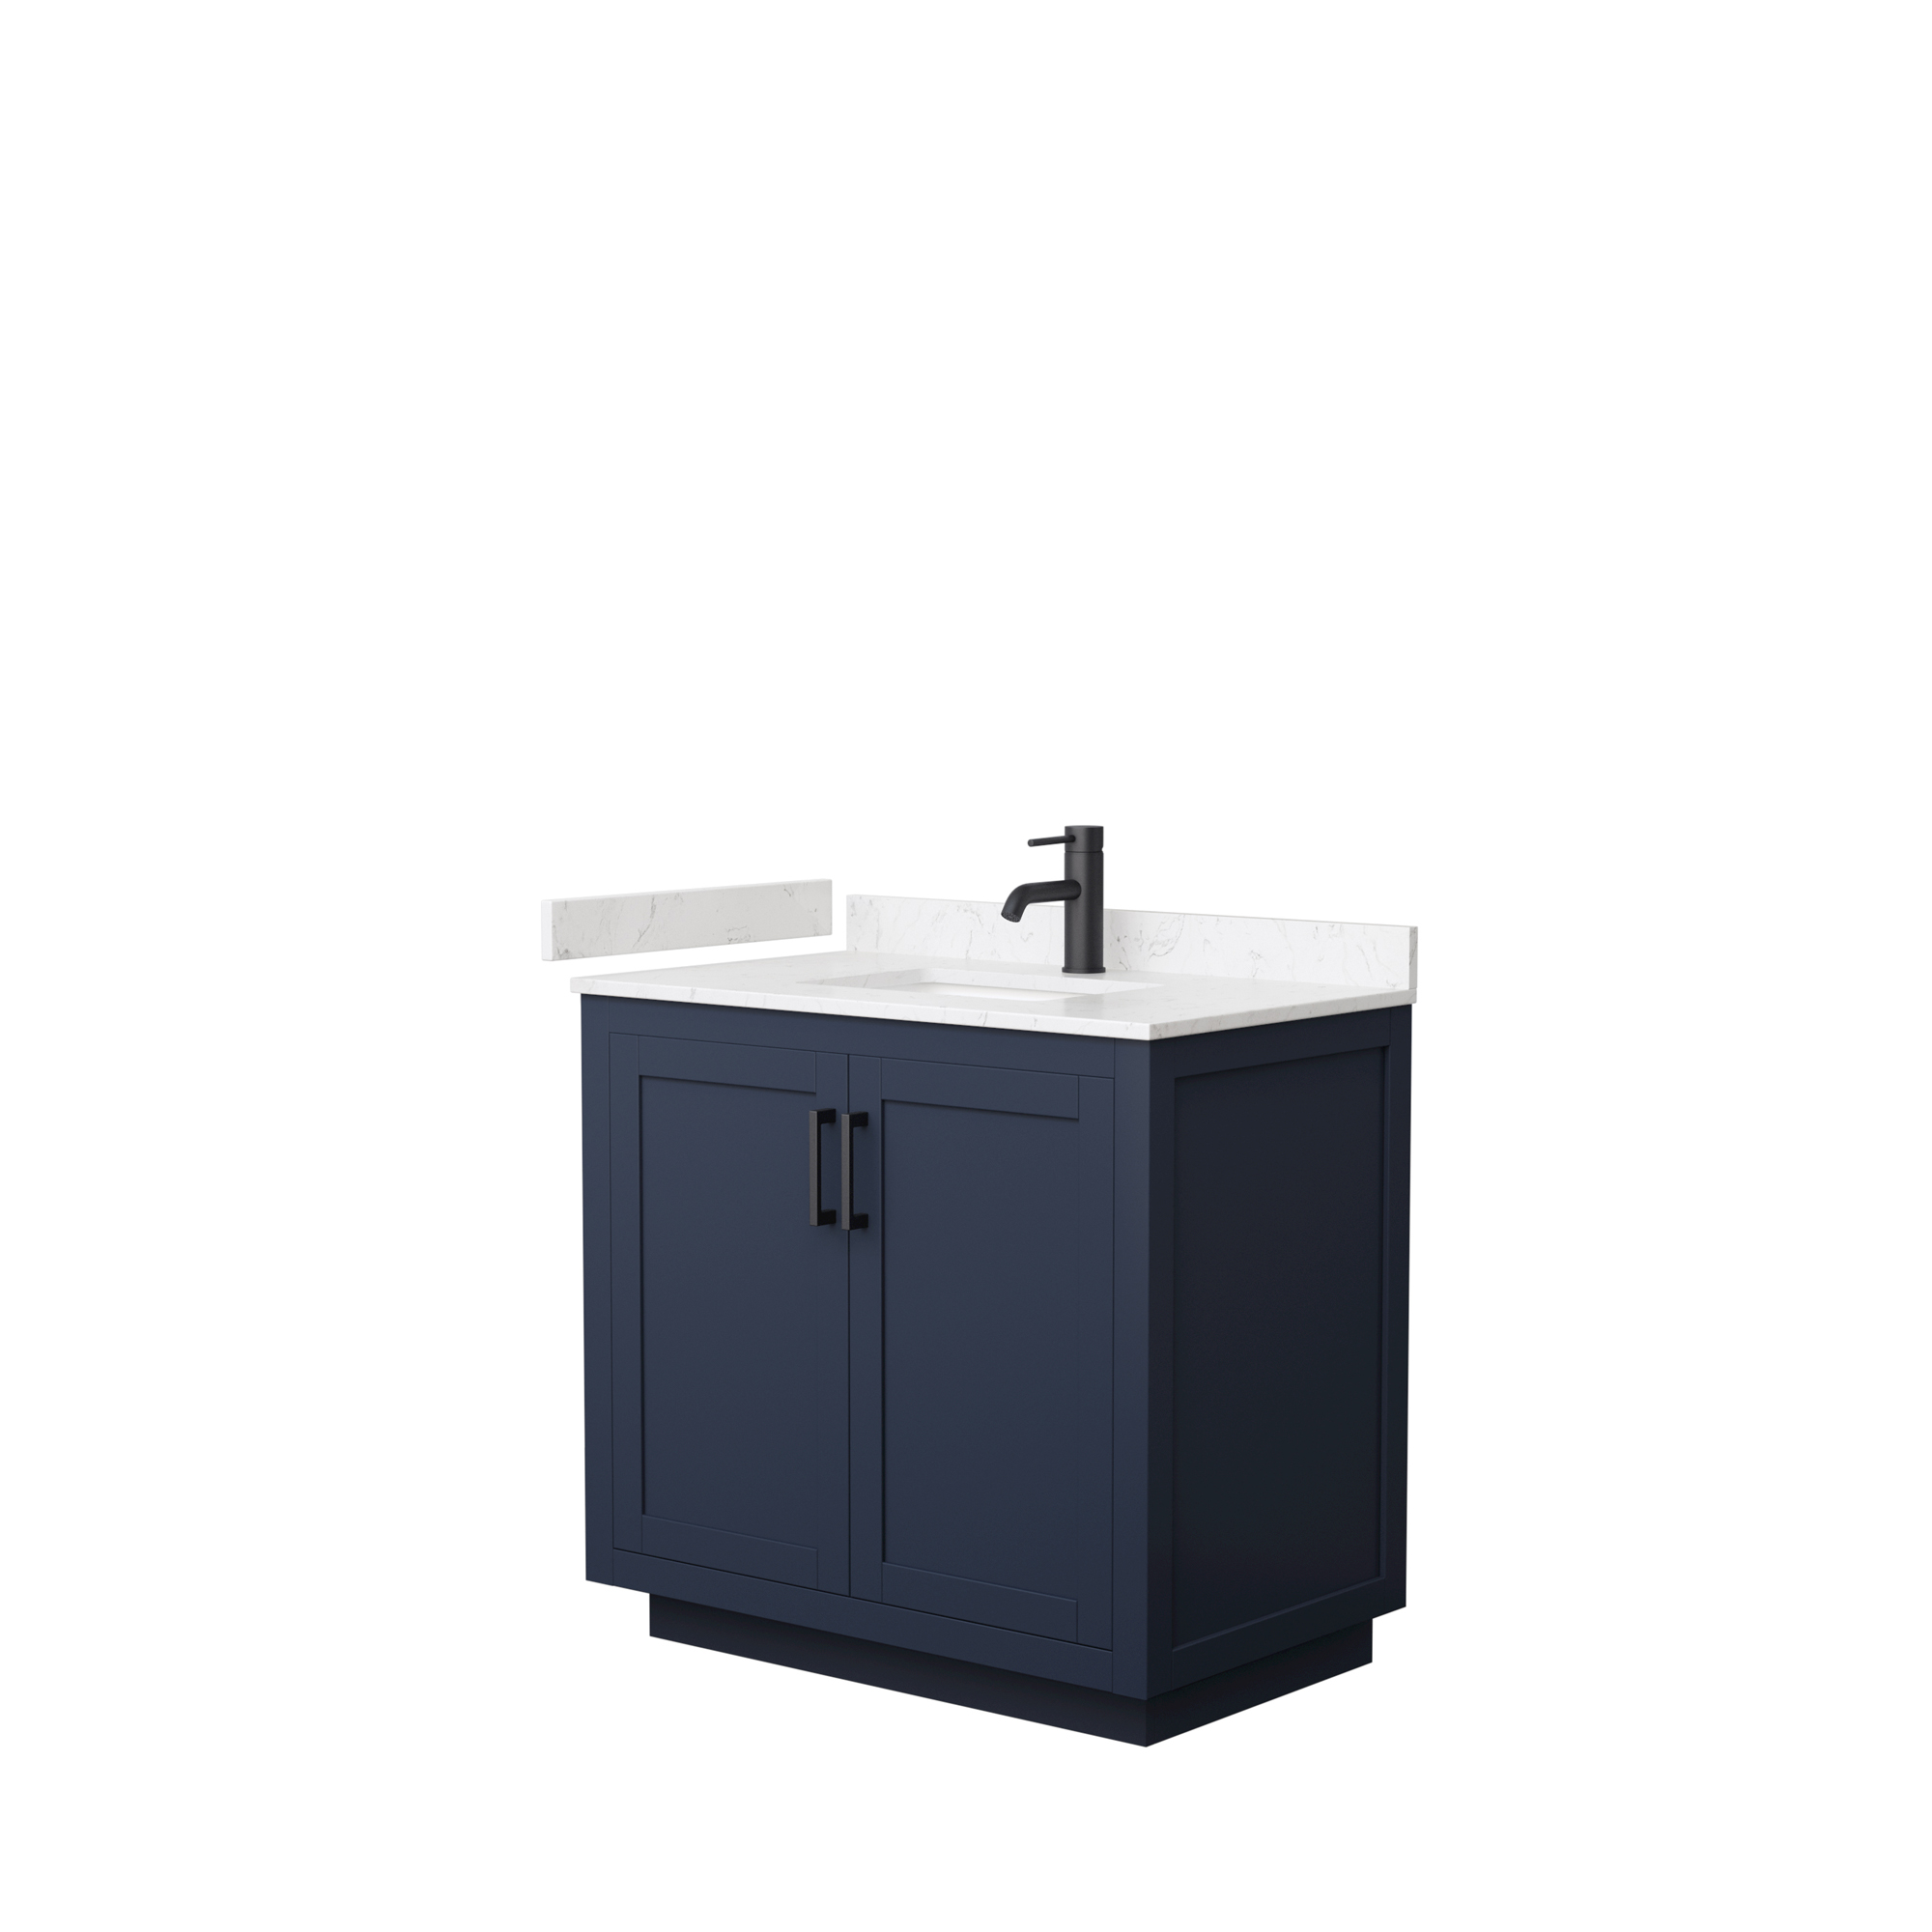 "36"" Single Bathroom Vanity in Dark Blue, Light-Vein Carrara Cultured Marble Countertop, Undermount Square Sink, Matte Black Trim"